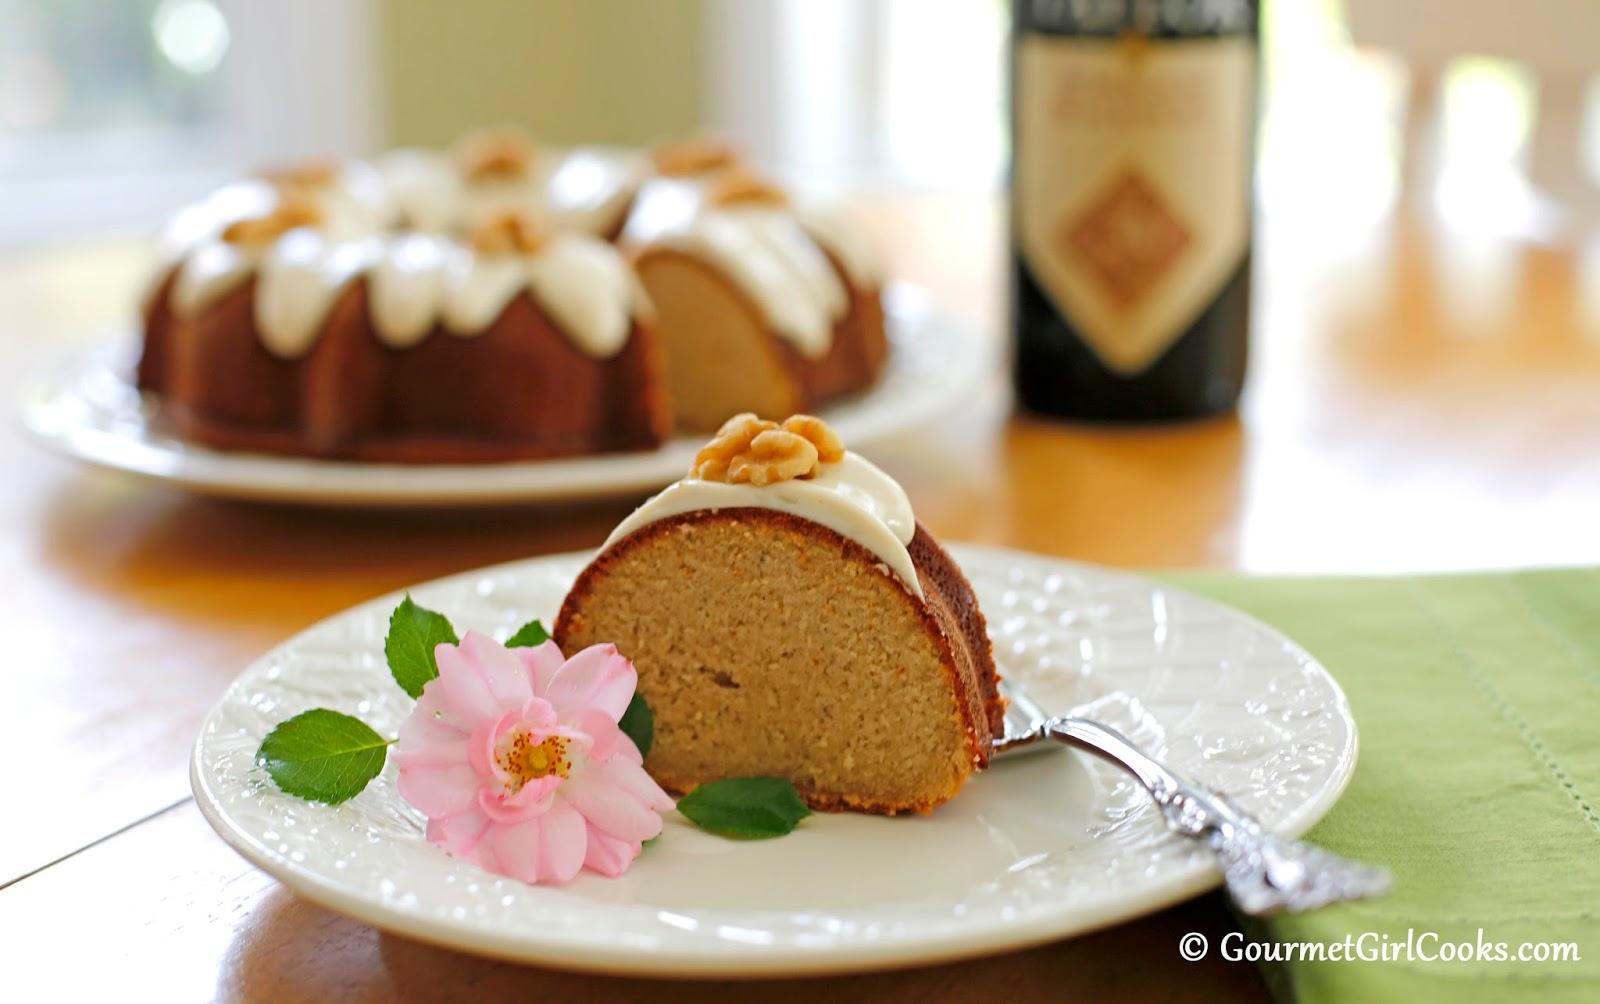 Gourmet Girl Cooks: Cream Sherry Bundt Cake - Low Carb, Sugar Free ...